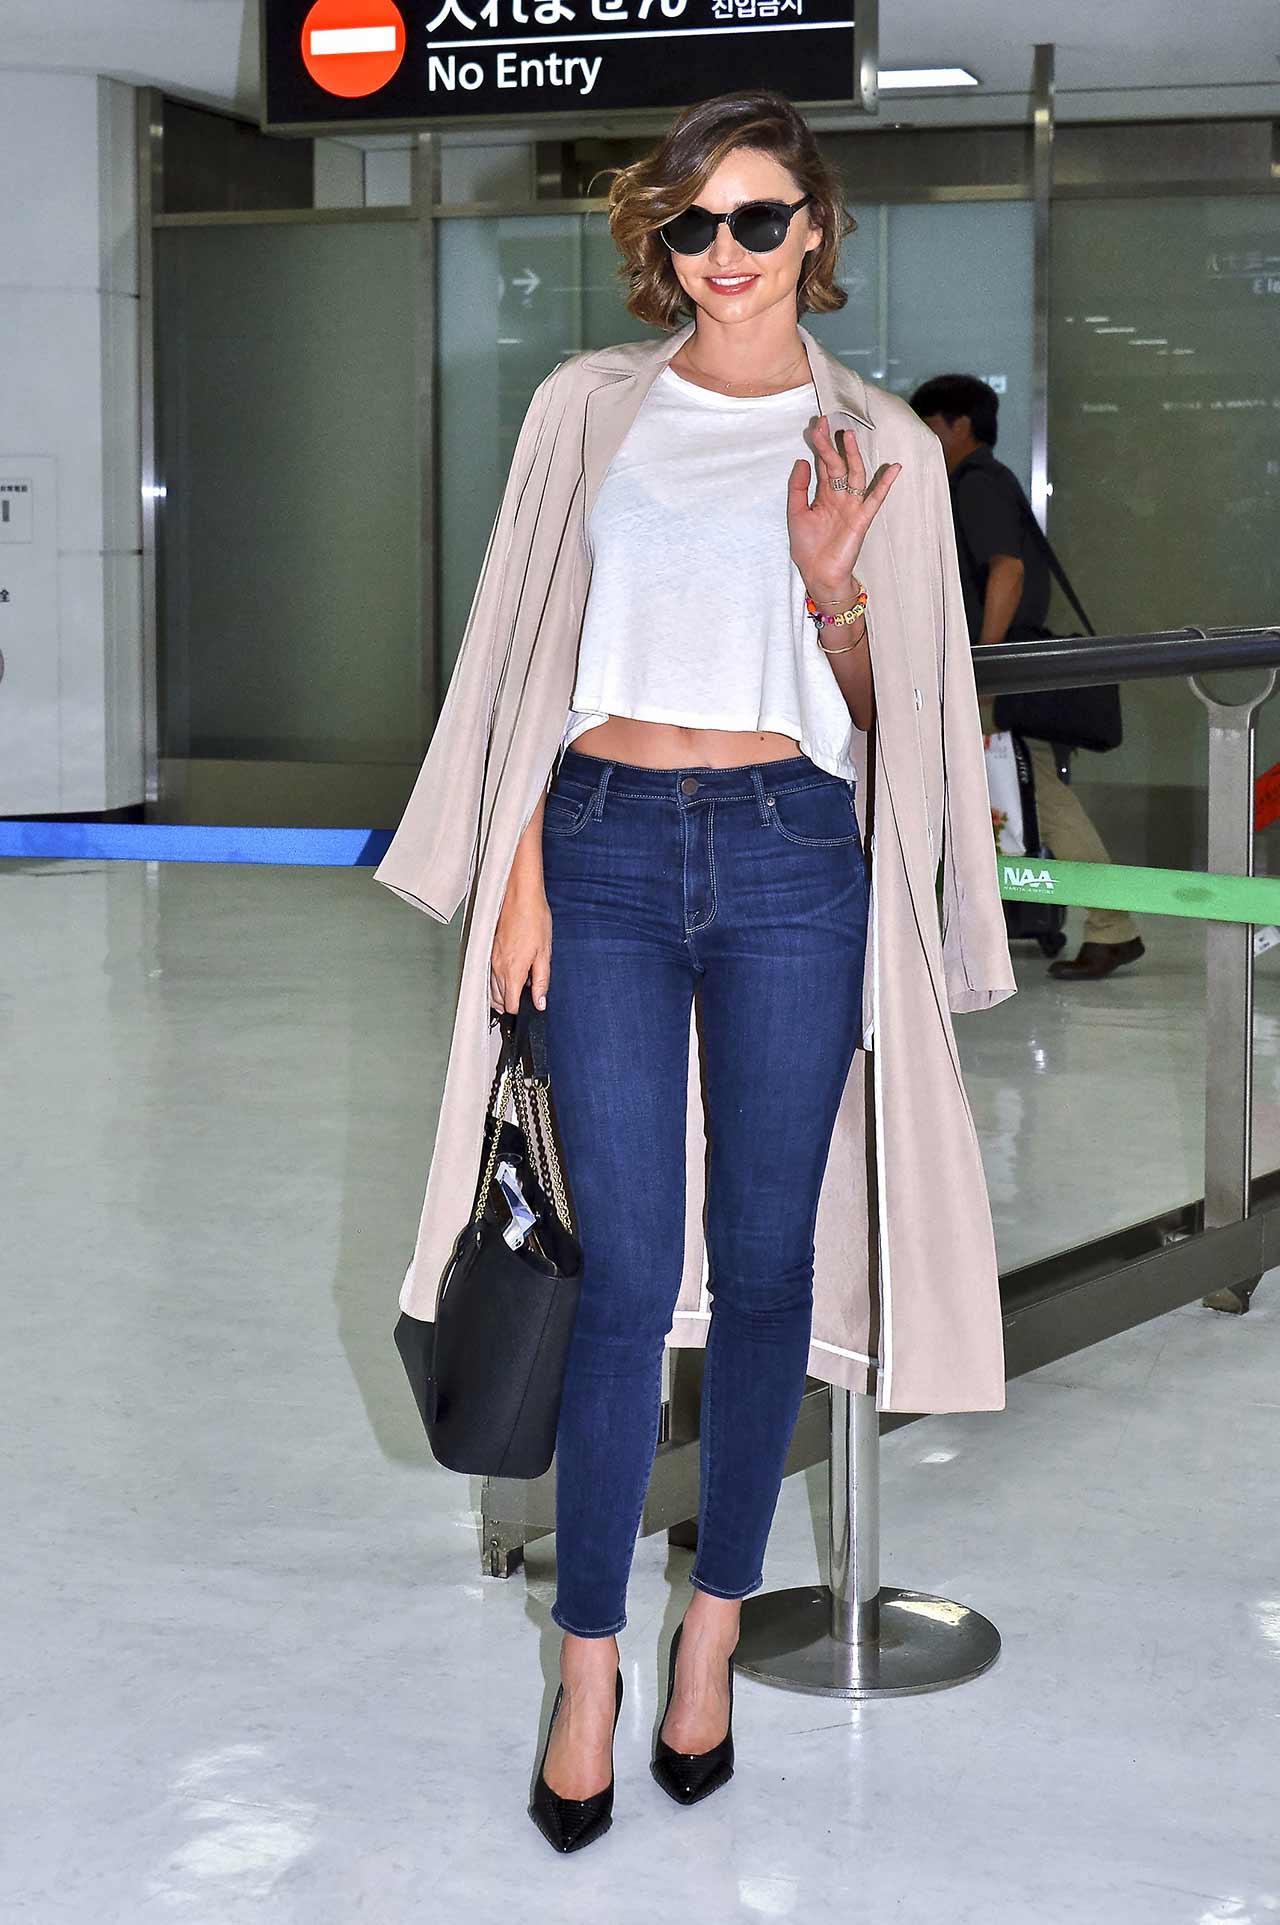 miranda-kerr-parker-smith-bombshell-skinny-jeans-in-empire